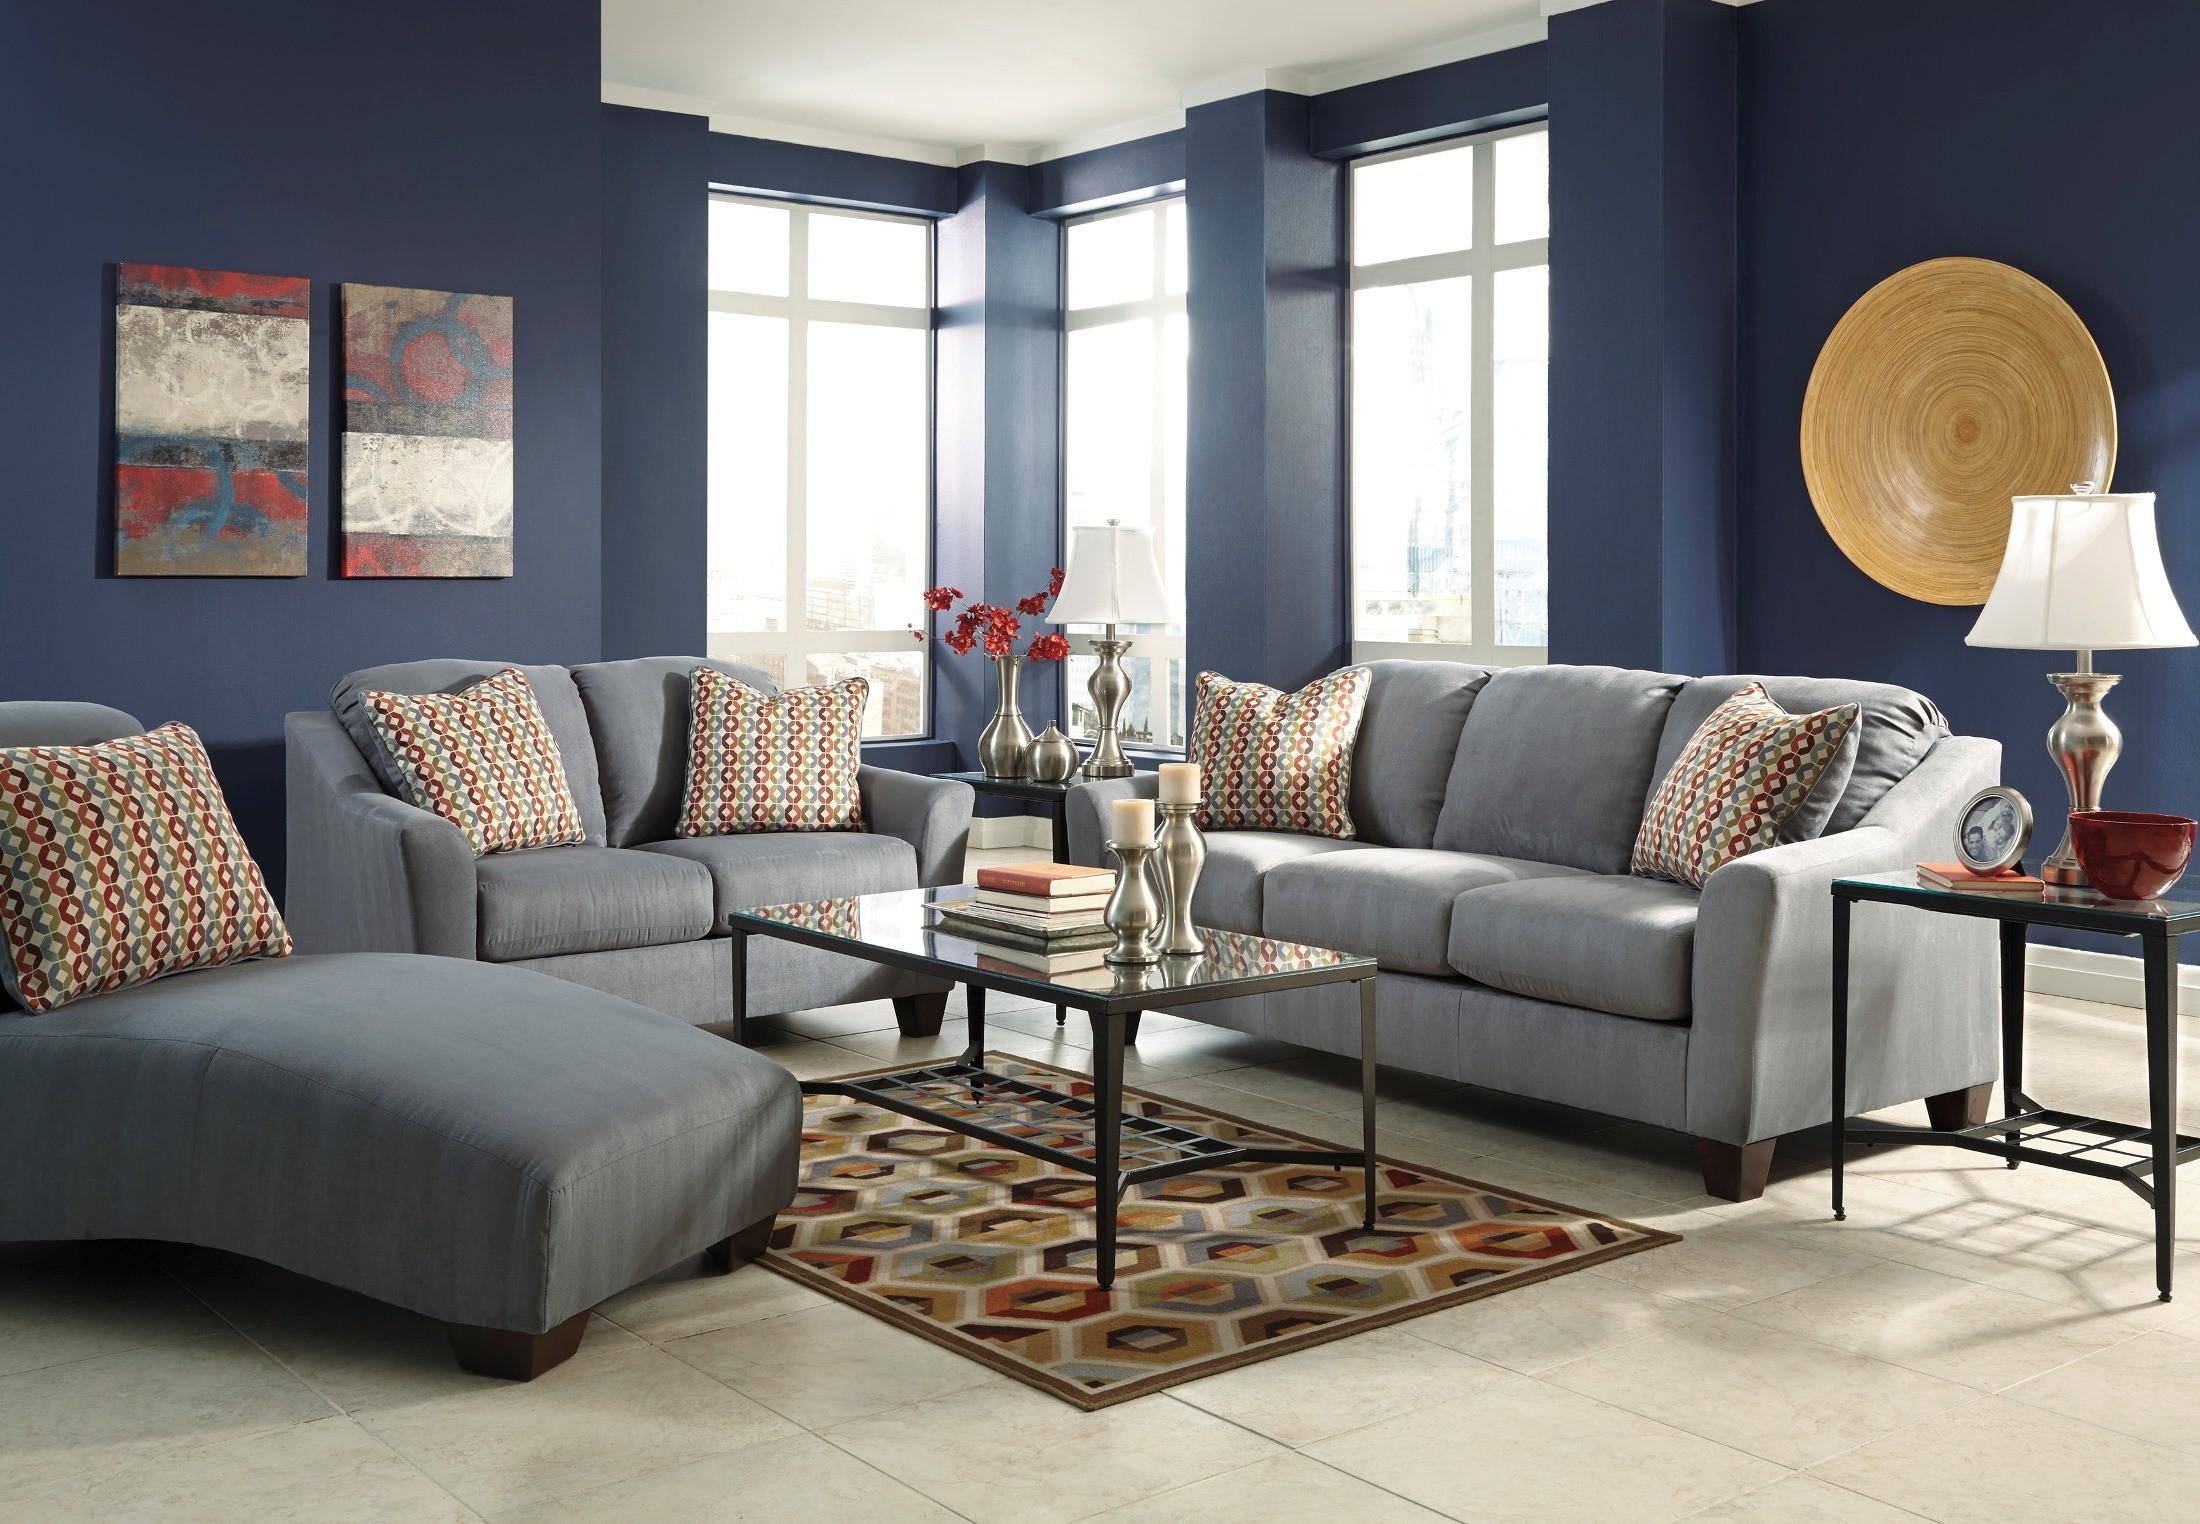 Hannin Lagoon Living Room Set From Ashley 95802 38 35